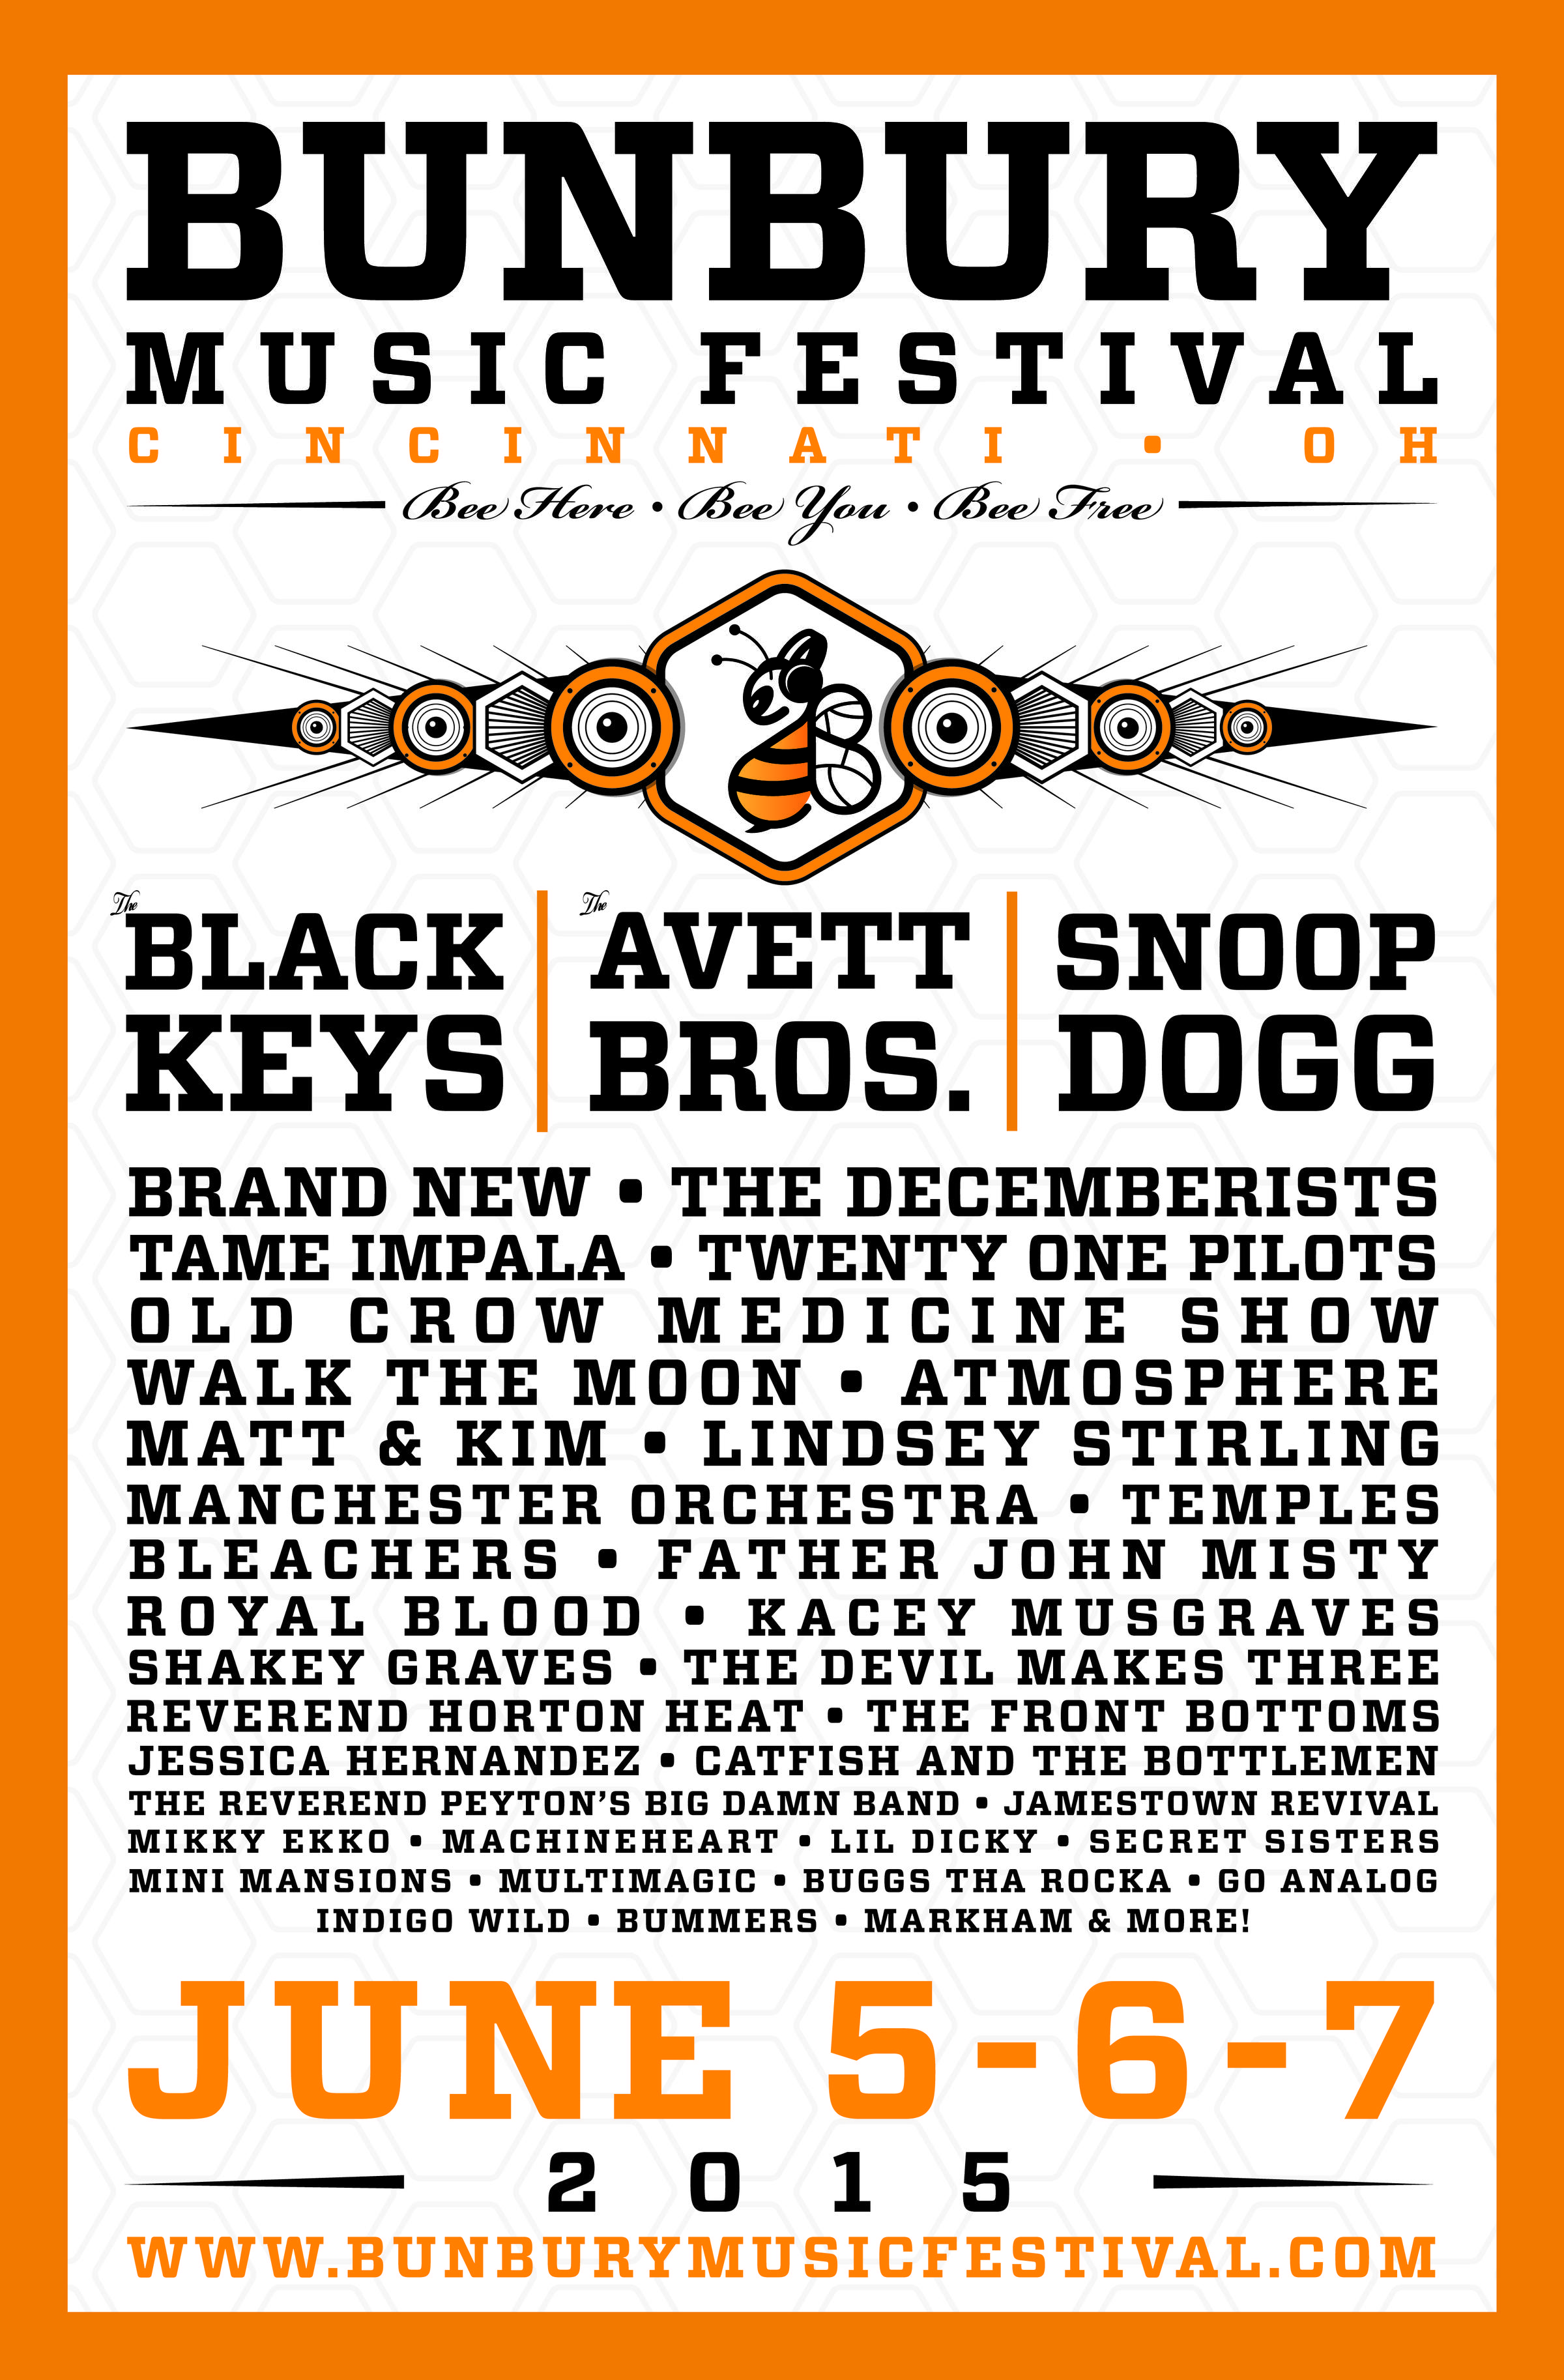 Bunbury Music Festival Announces 2015 Artist Lineup... The ...